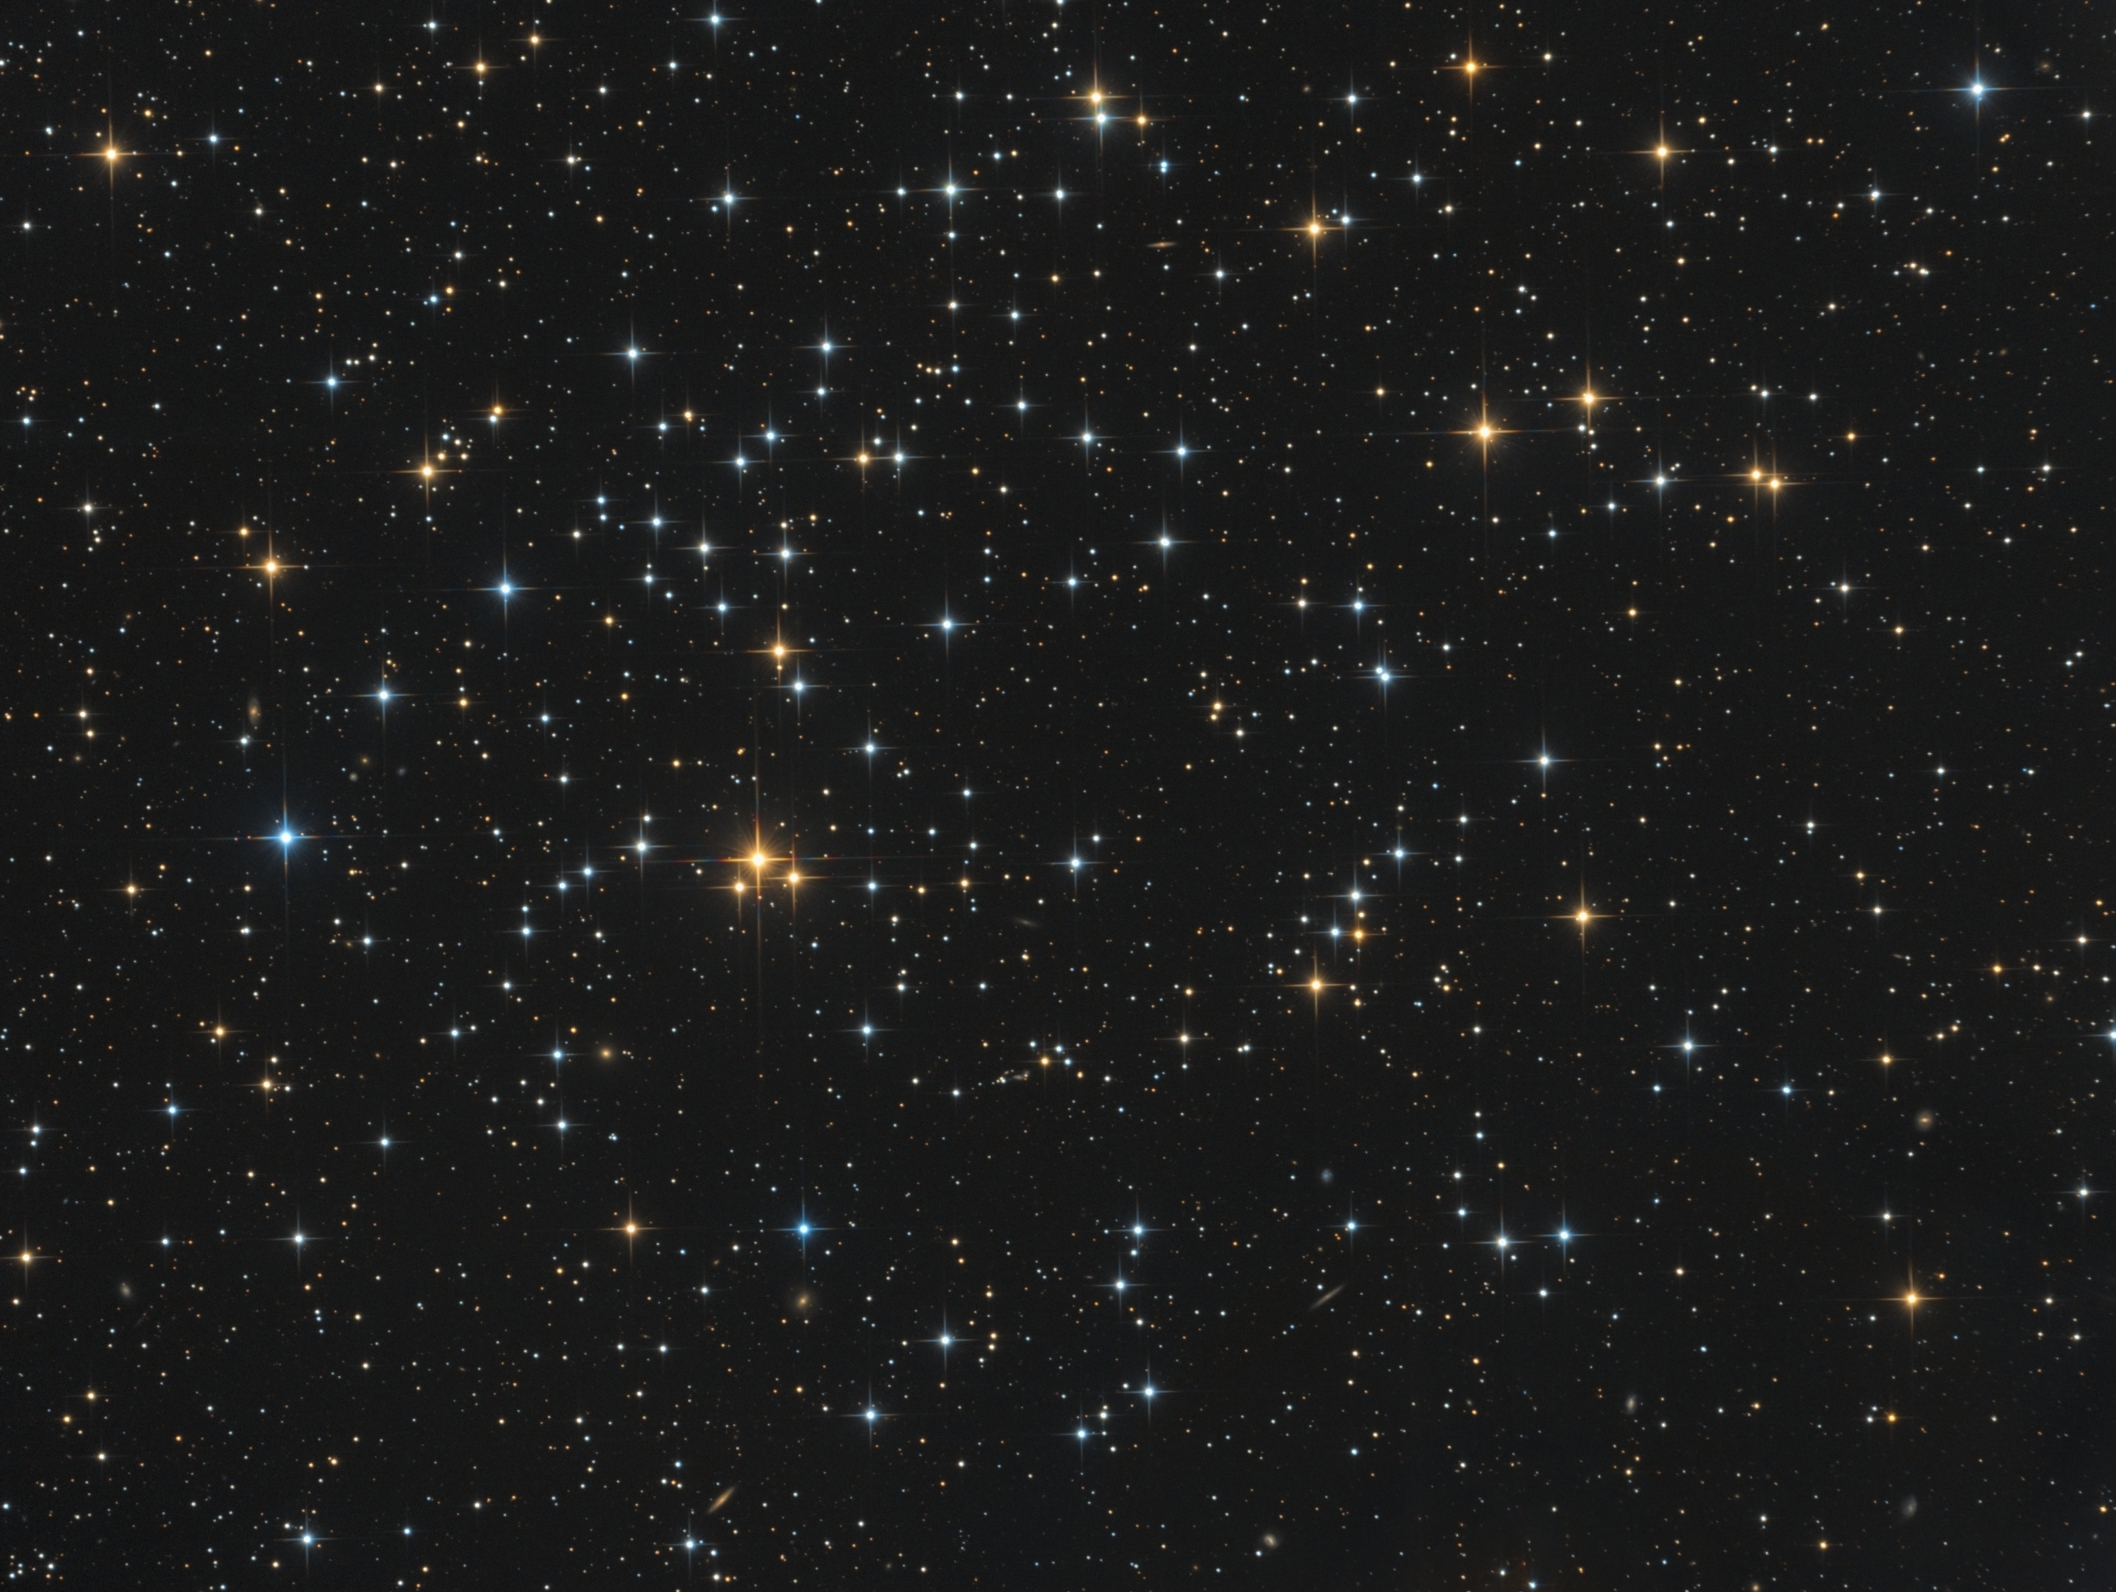 NGC 752 – Wikipedia